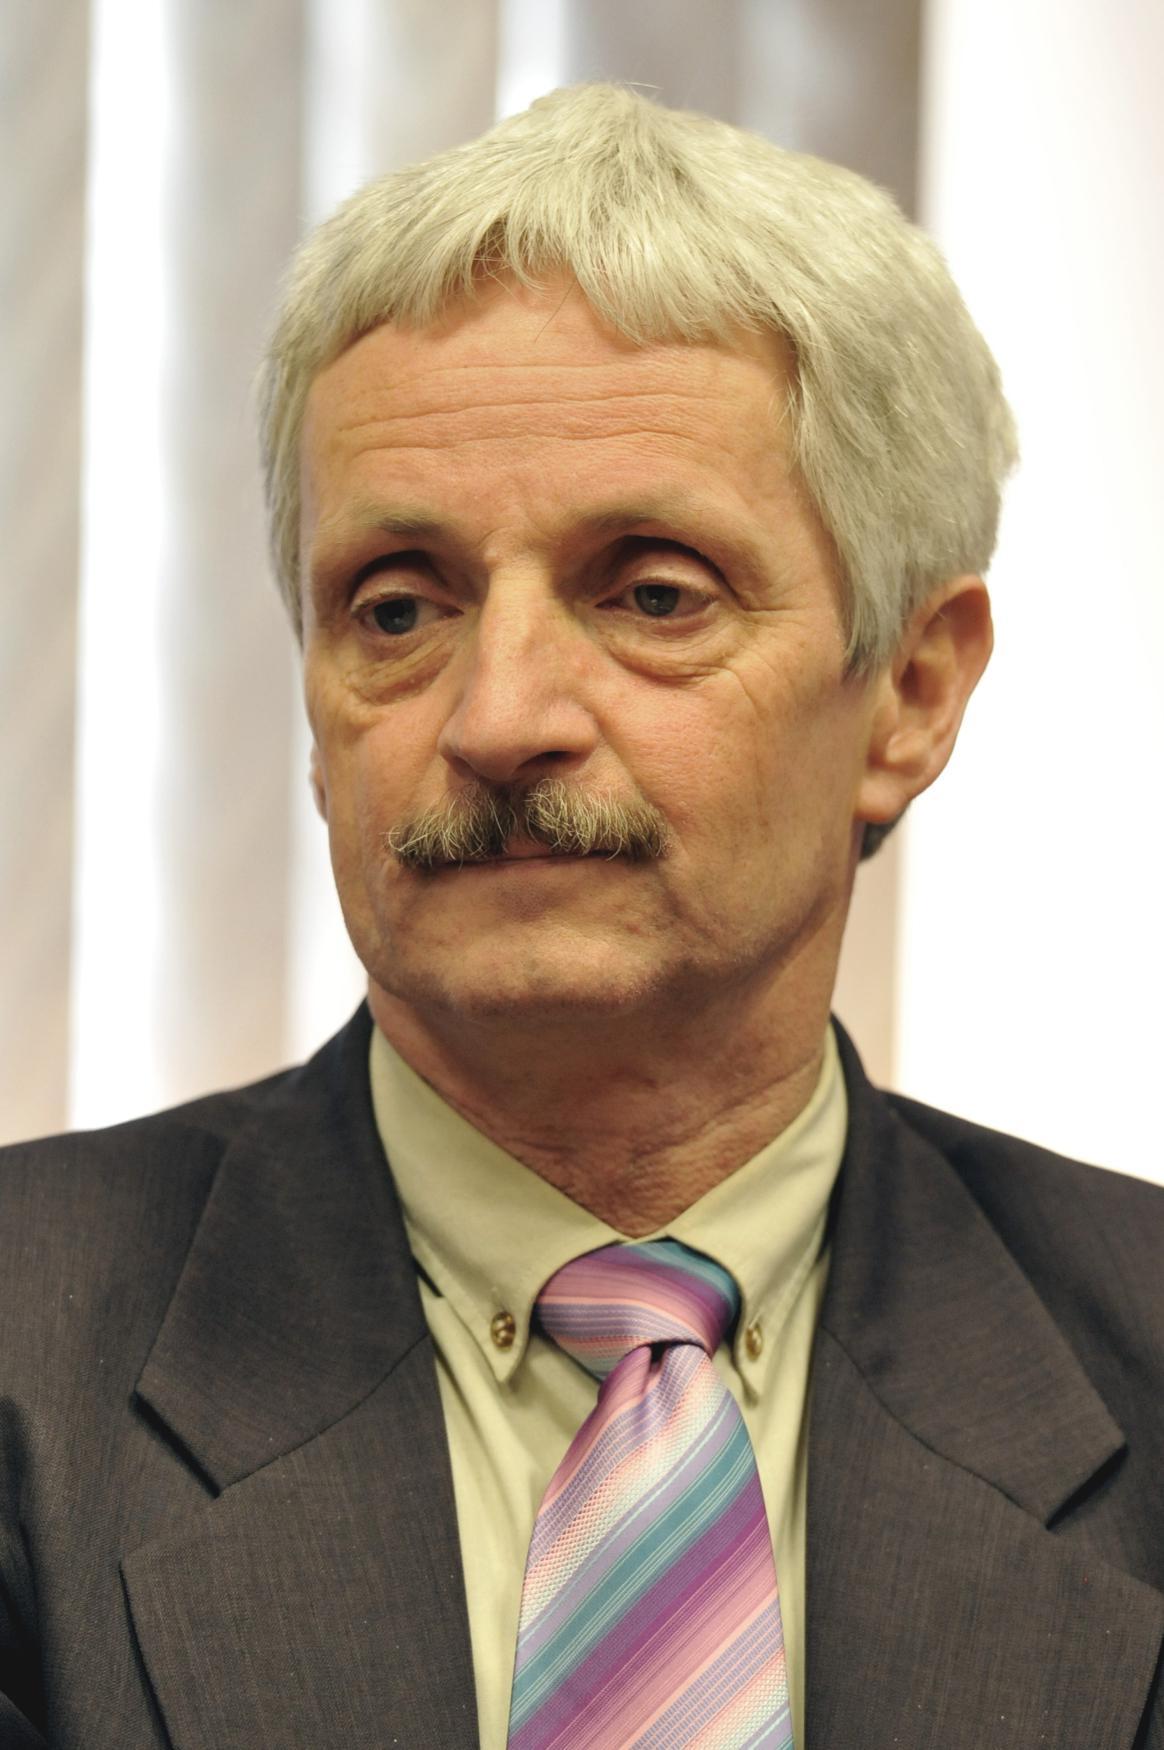 Dalibor Blažek